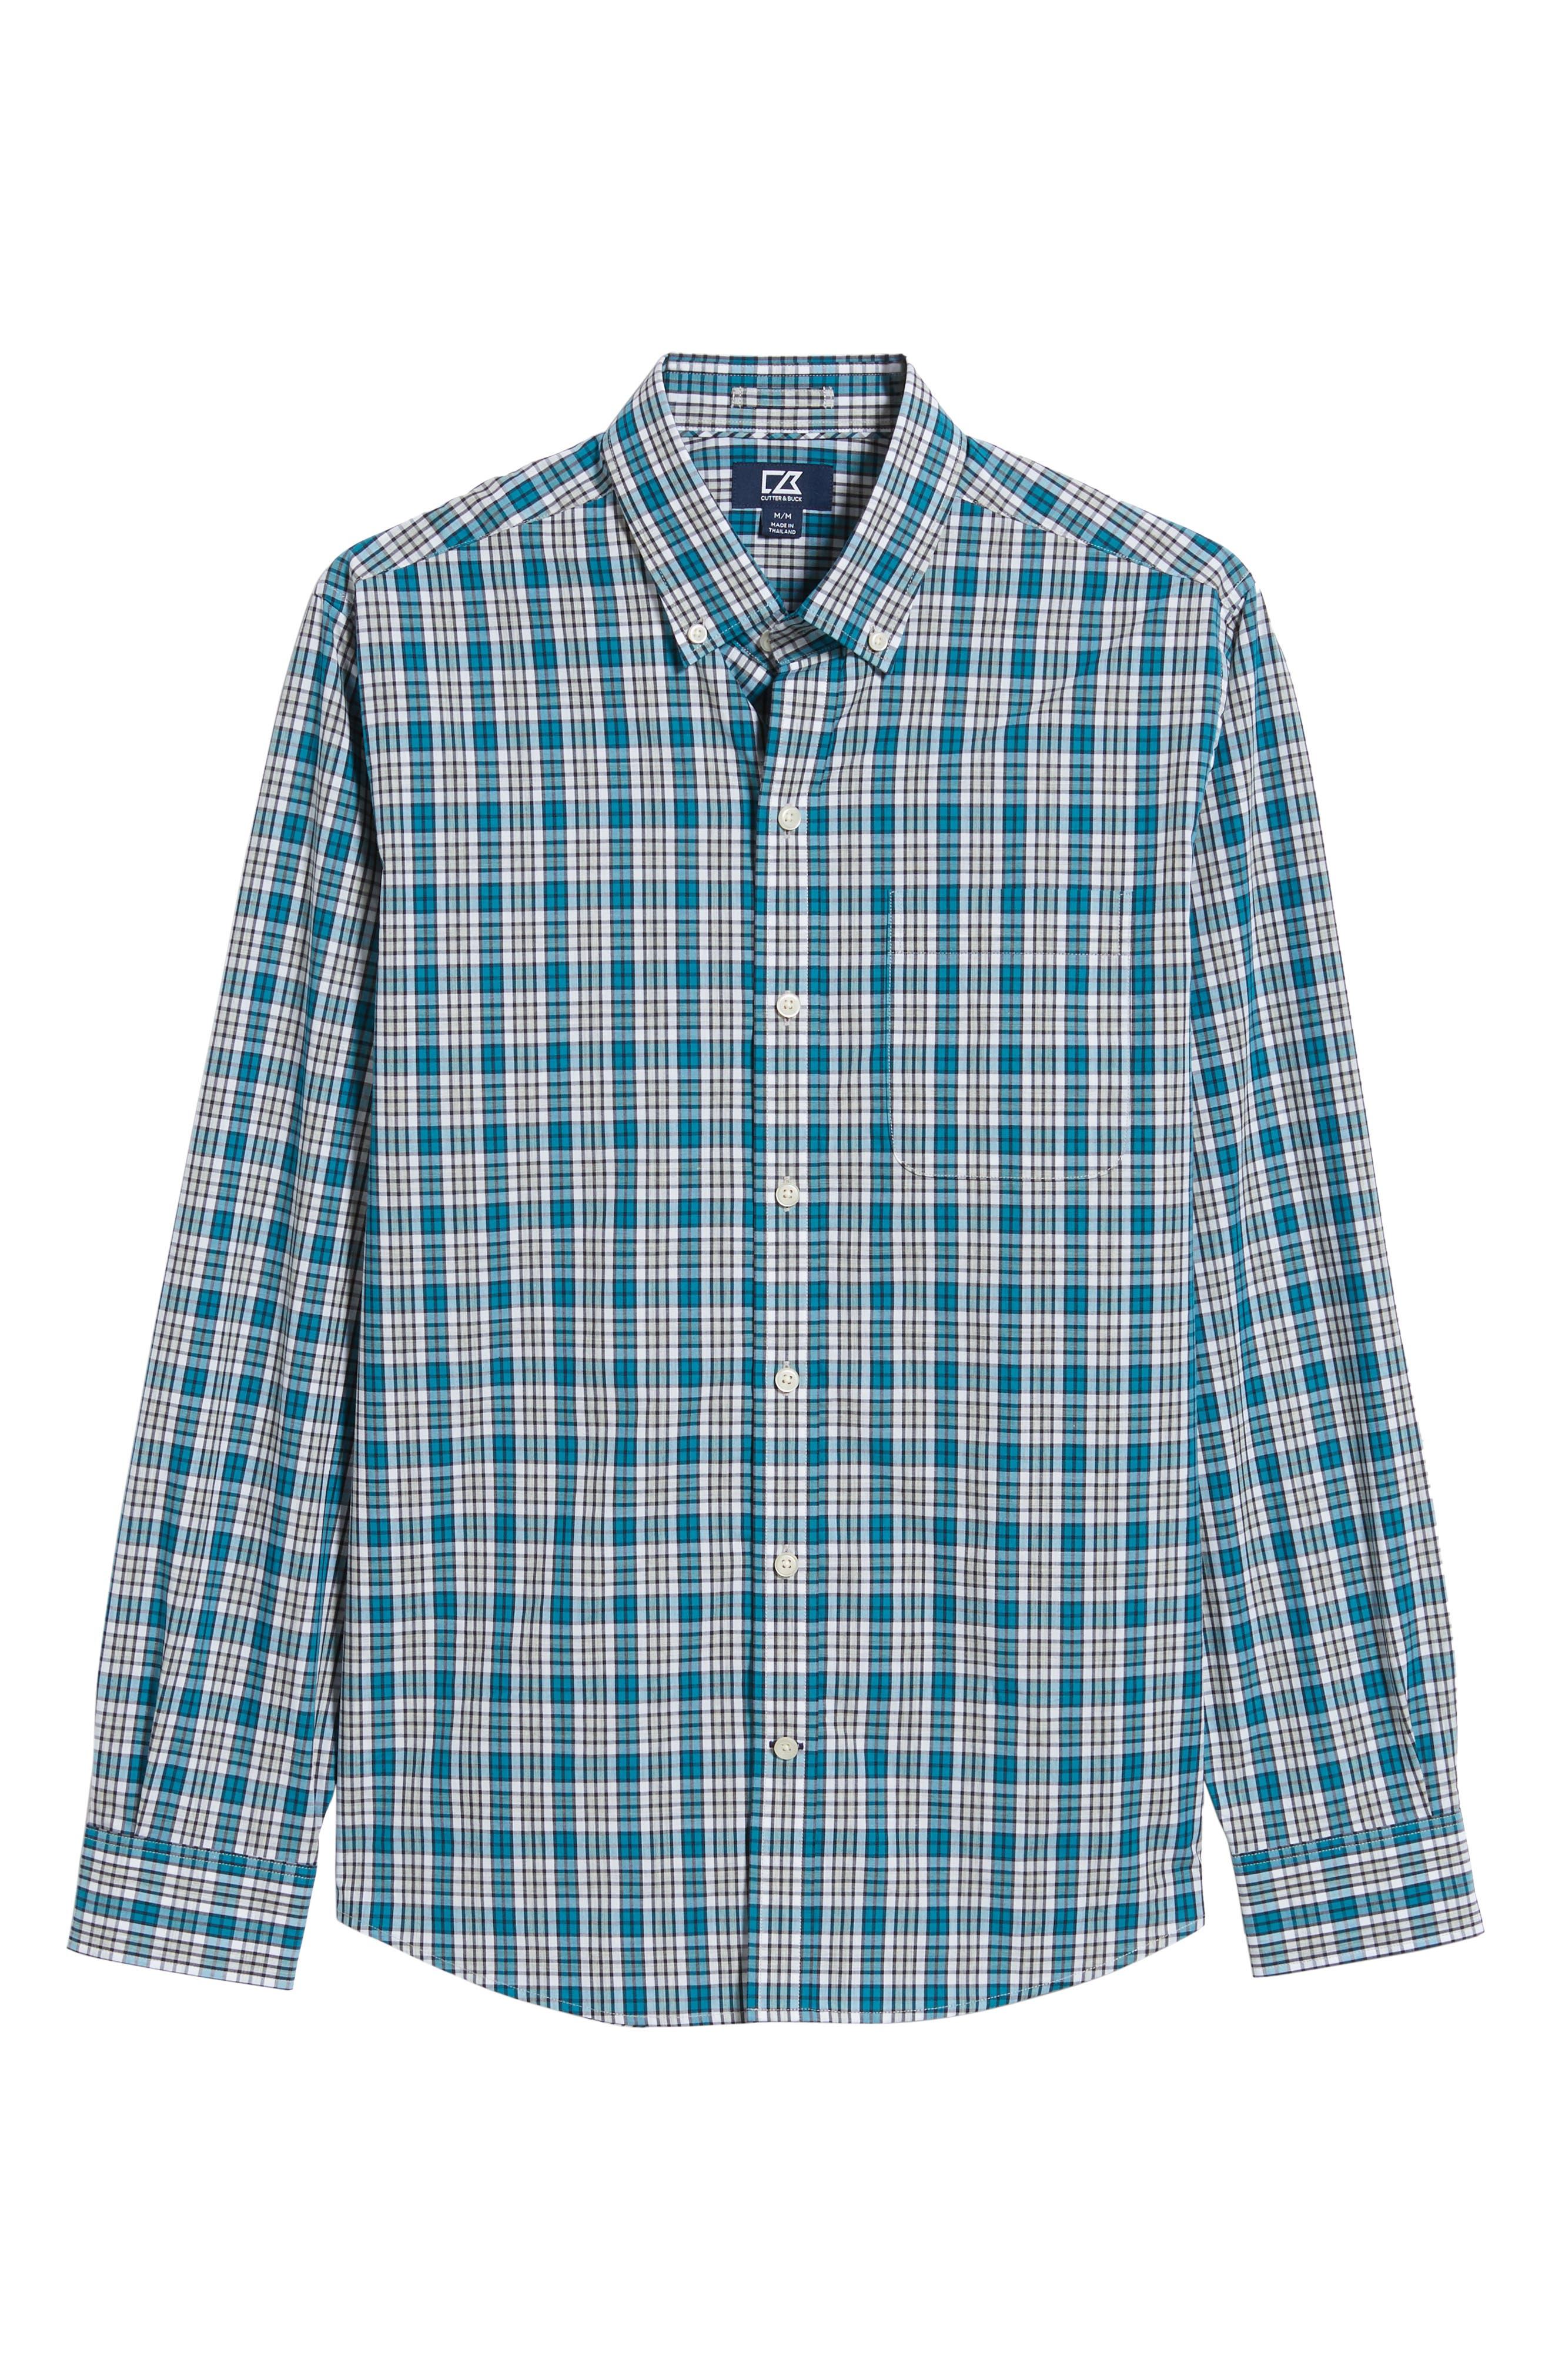 Harris Regular Fit Non-Iron Plaid Sport Shirt,                             Alternate thumbnail 5, color,                             AQUATIC